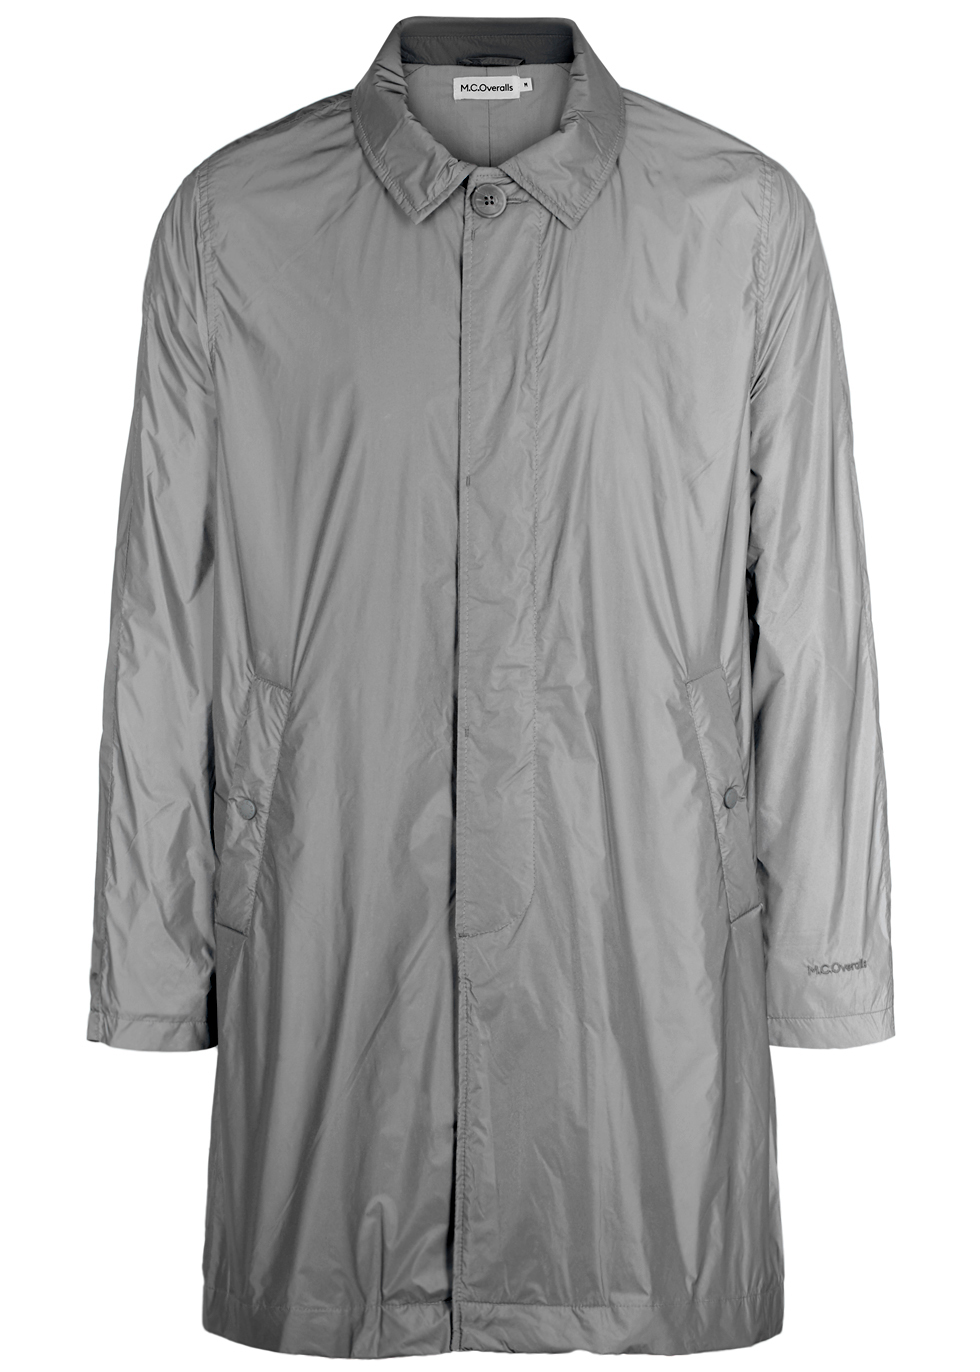 M.C. OVERALLS Grey Reflective Shell Coat